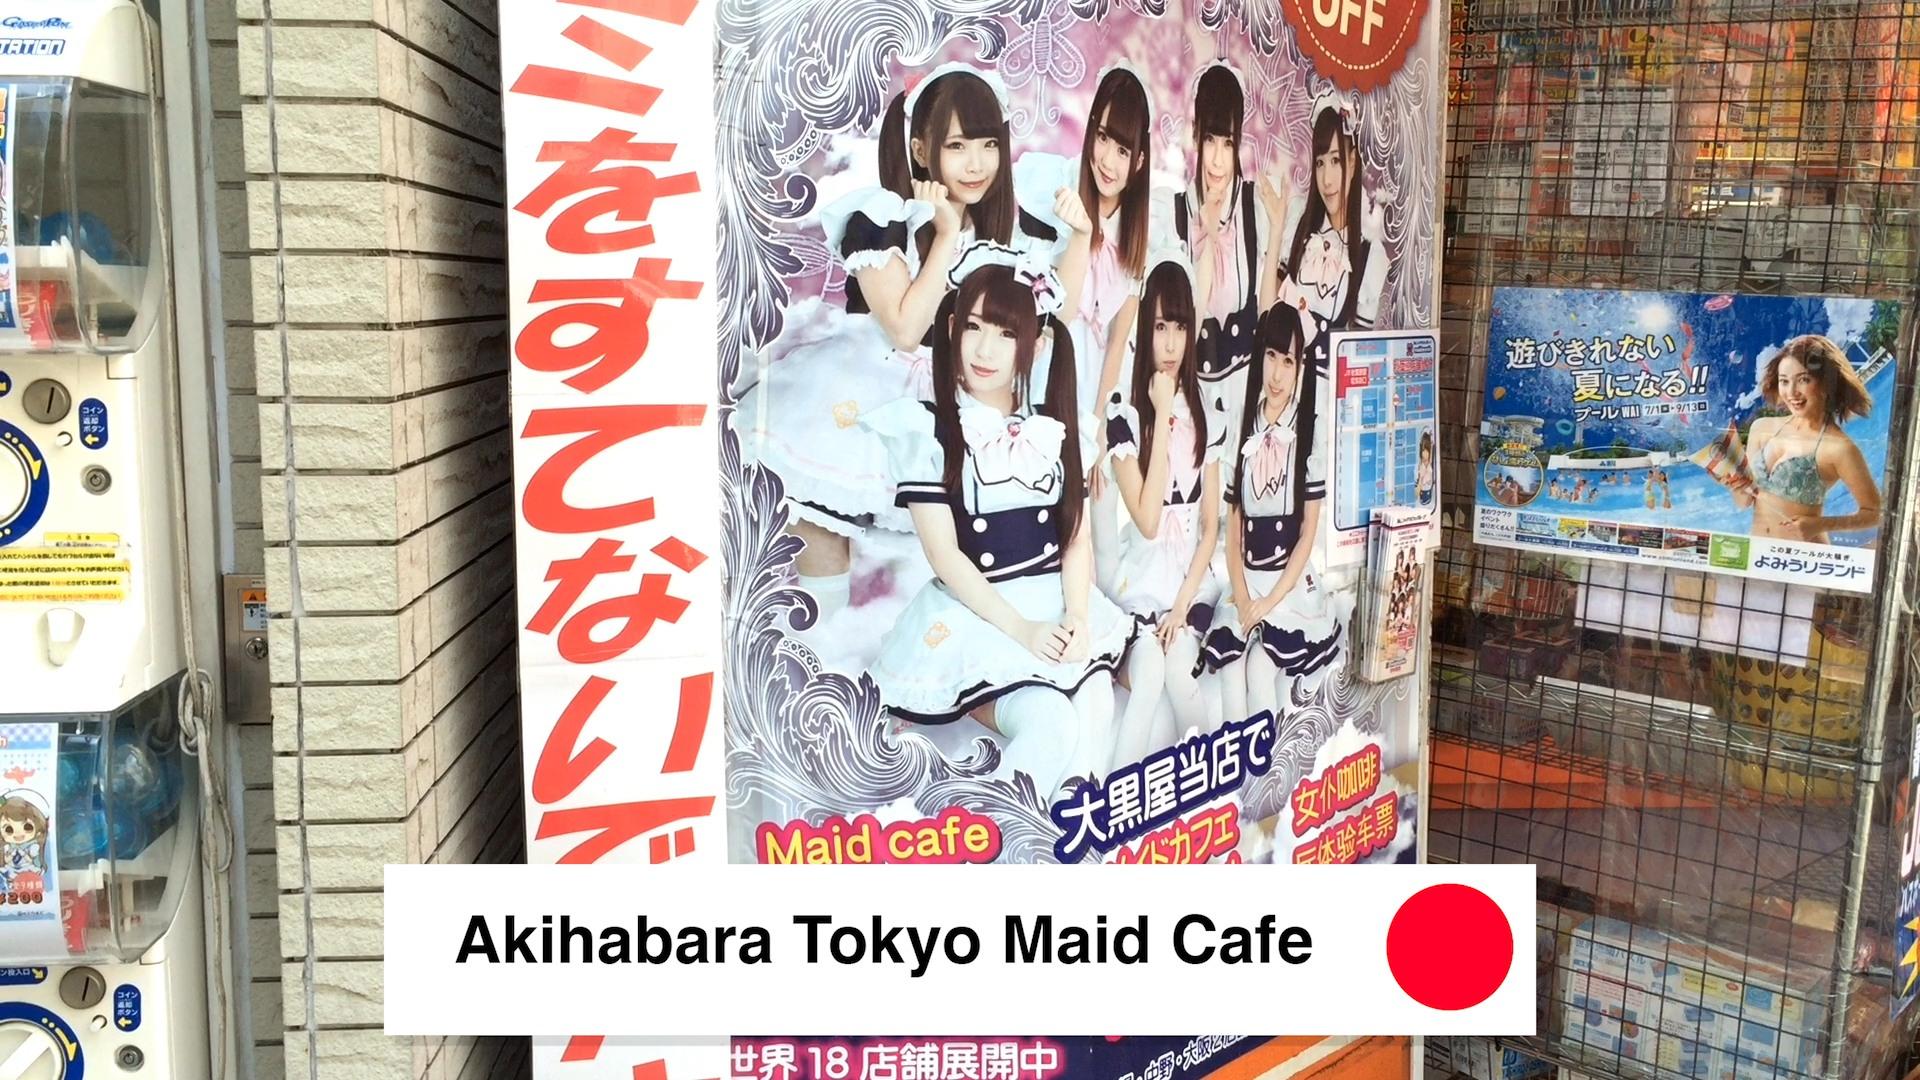 Akihabara Tokyo Maid Cafe - Akihabara Tokyo Anime District - Walking Around Akihabara Tokyo What To Do 2018 - Loot Anime Discount Code 2018 🇯🇵 🏙 📦